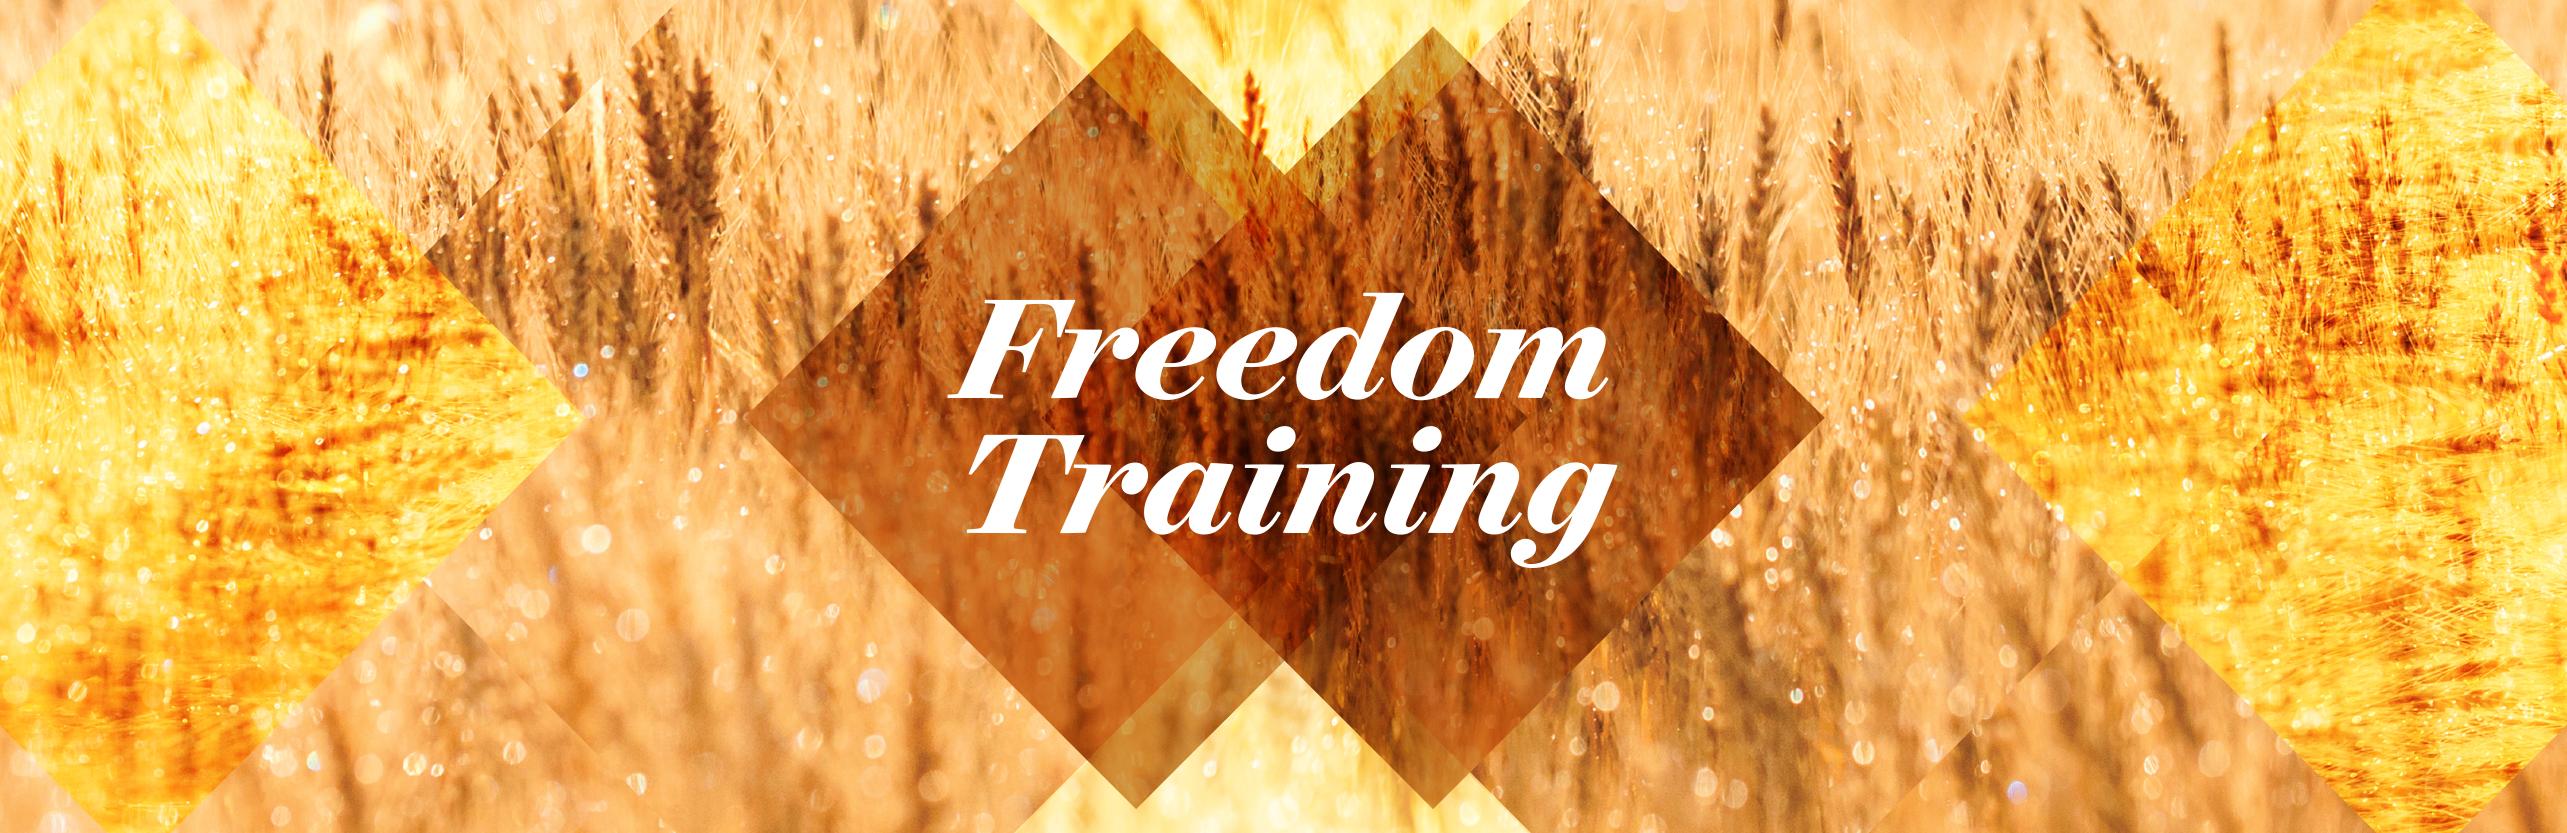 5400 frdm 17 freedom training teb 616x200